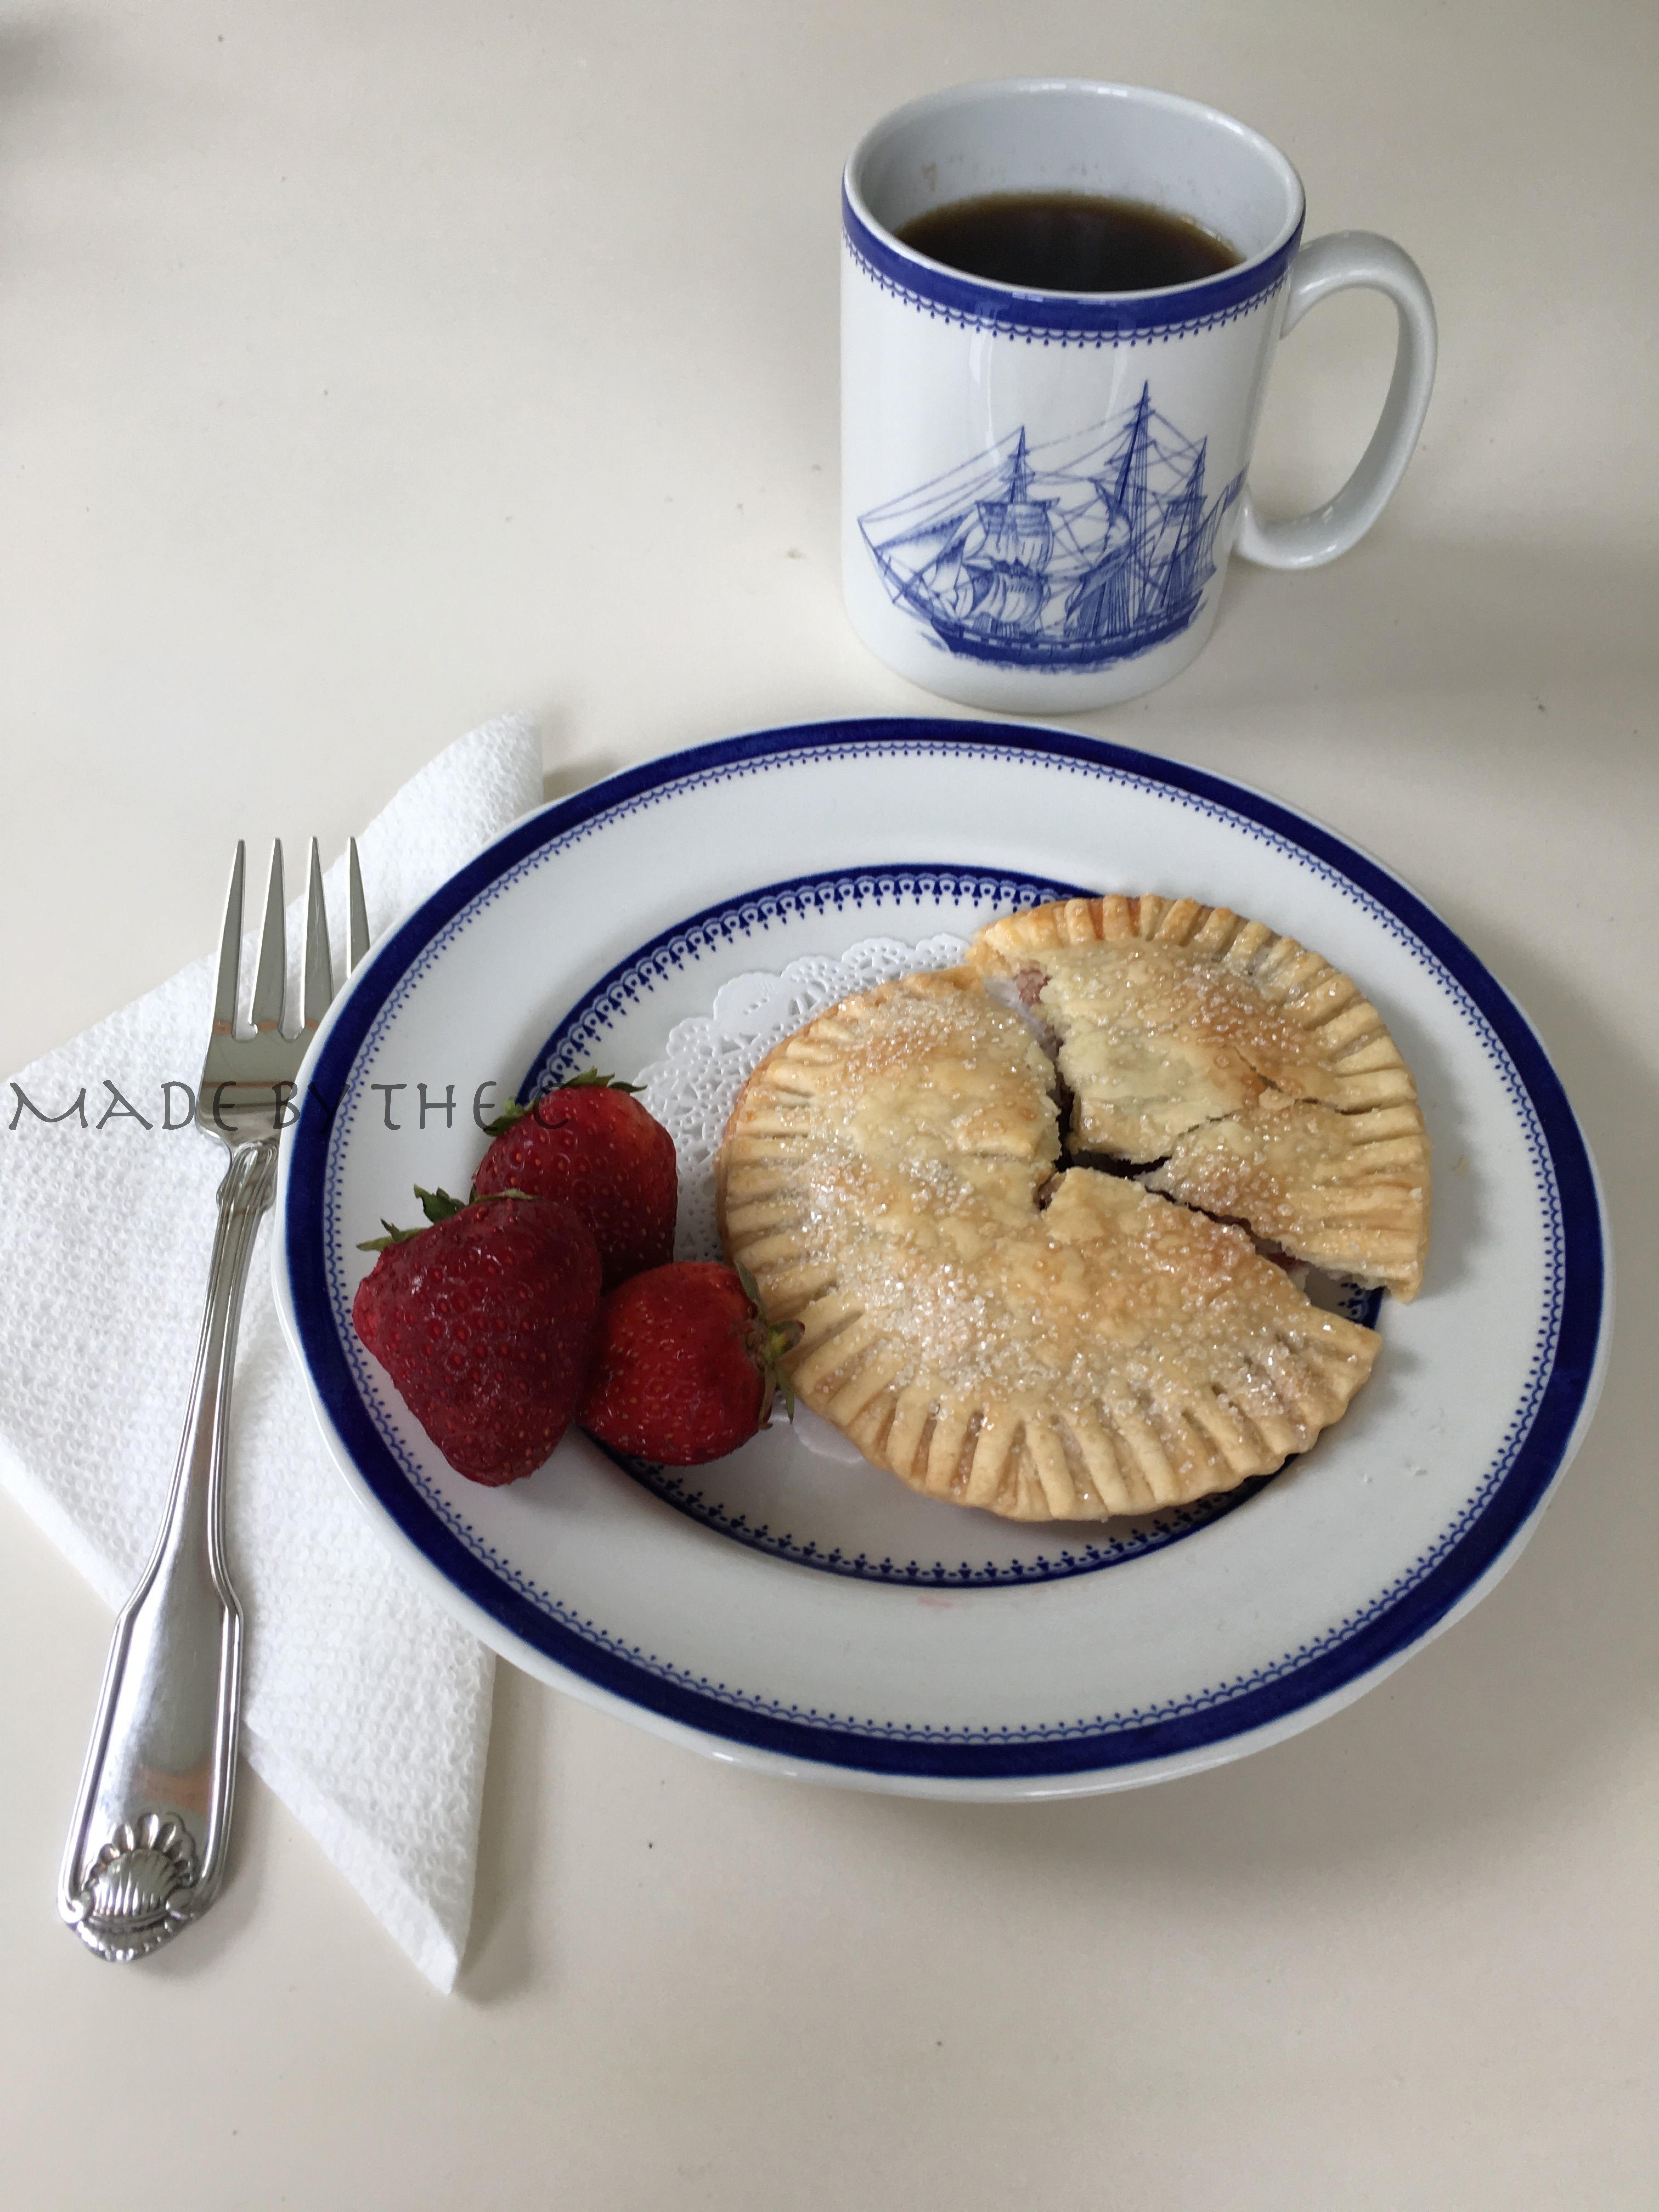 Blueberry on plate_1.jpg